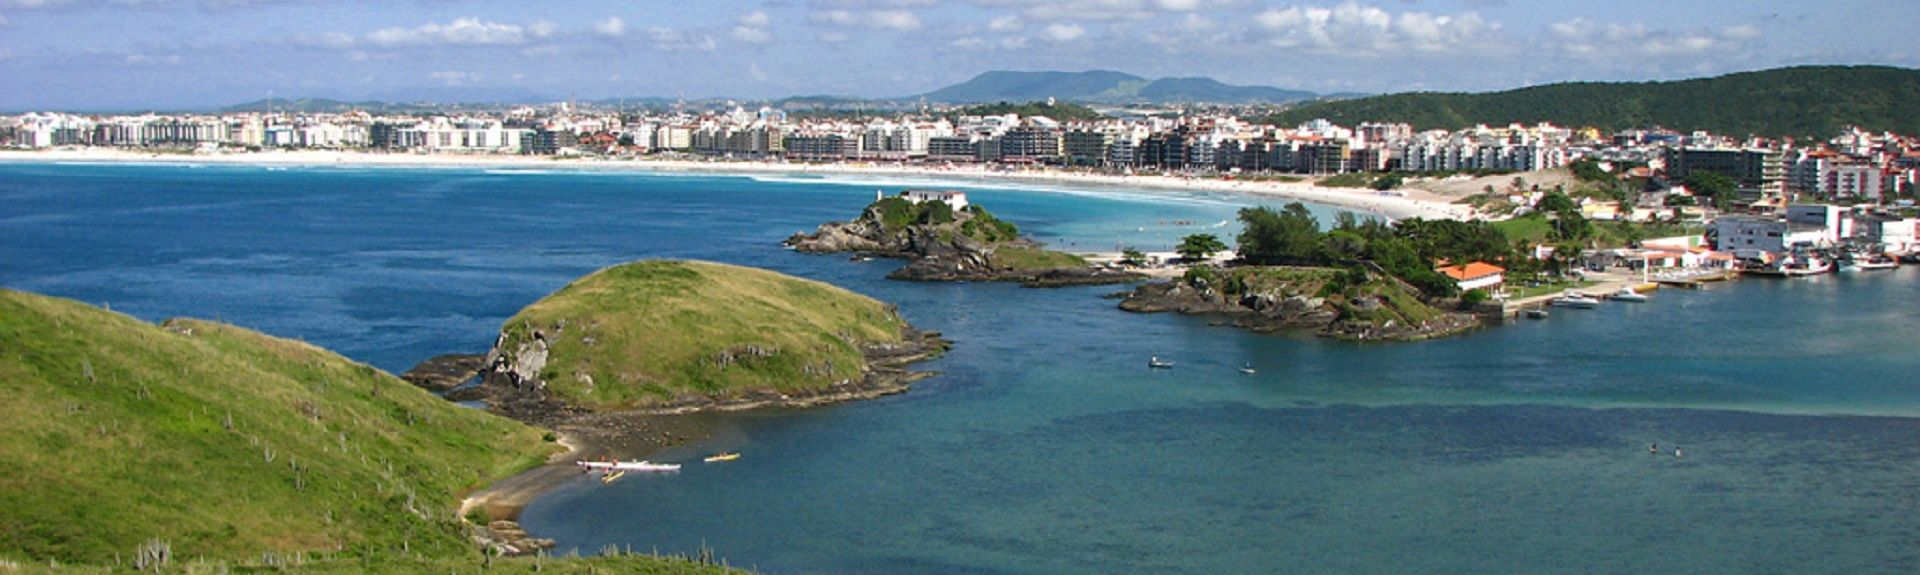 Praia do Foguete, Rio de Janeiro, BR